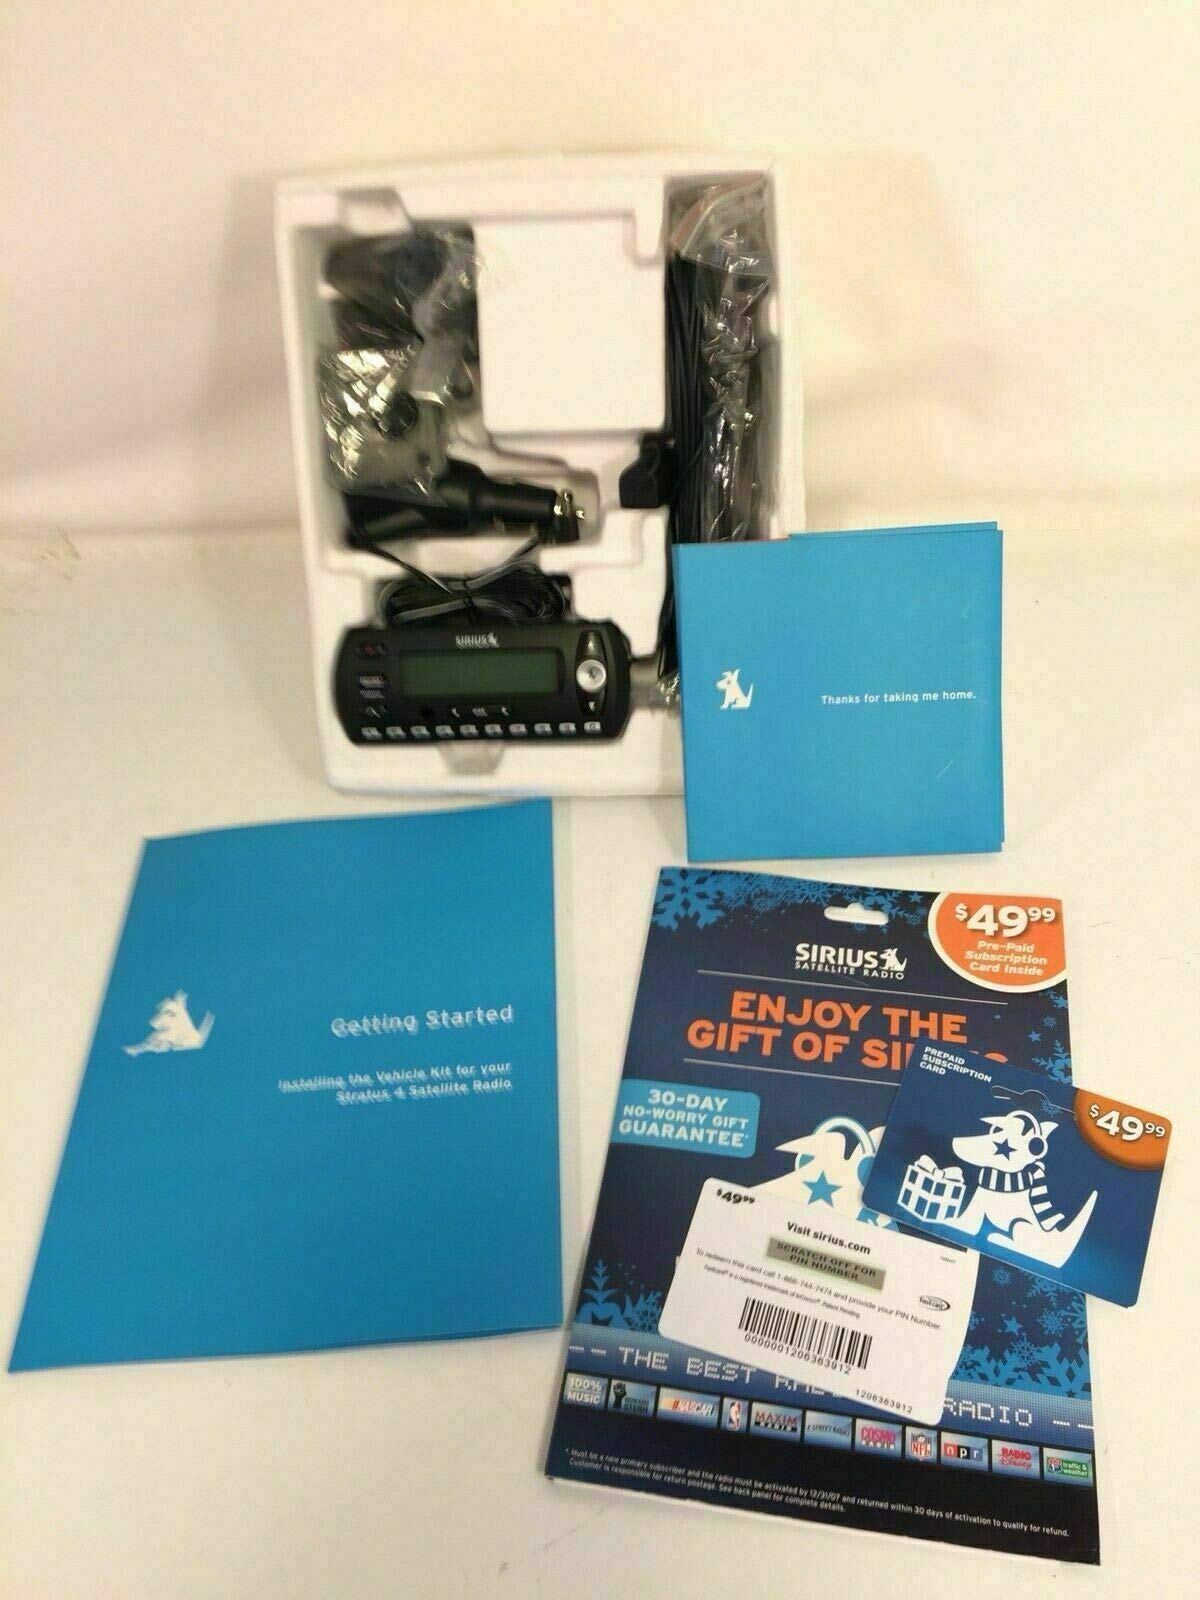 PHOENIX FINDS TREASURES Sirius Satellite Radio Stratus Car Kit Model SV4 Pre Paid Extra